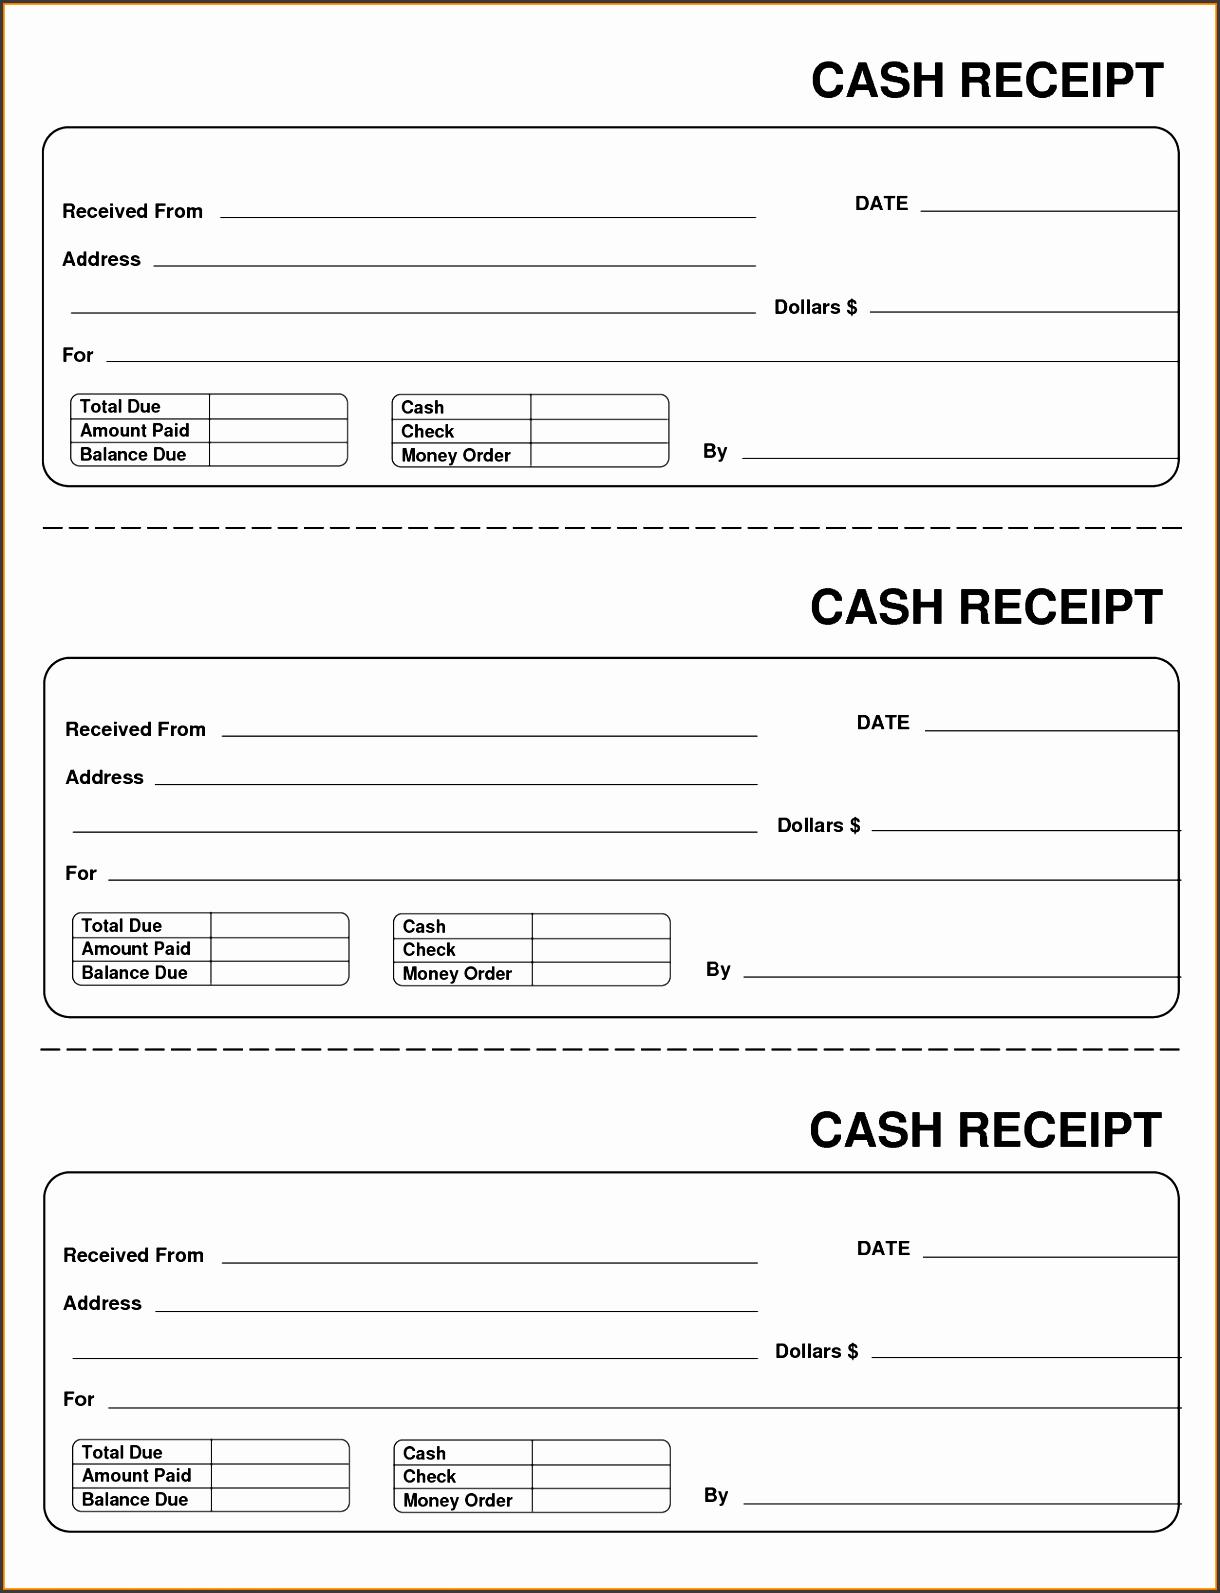 payment receipt sample define breakeven analysis process flow 8 cash receipt ideas collection loan payment receipt template of loan payment receipt template